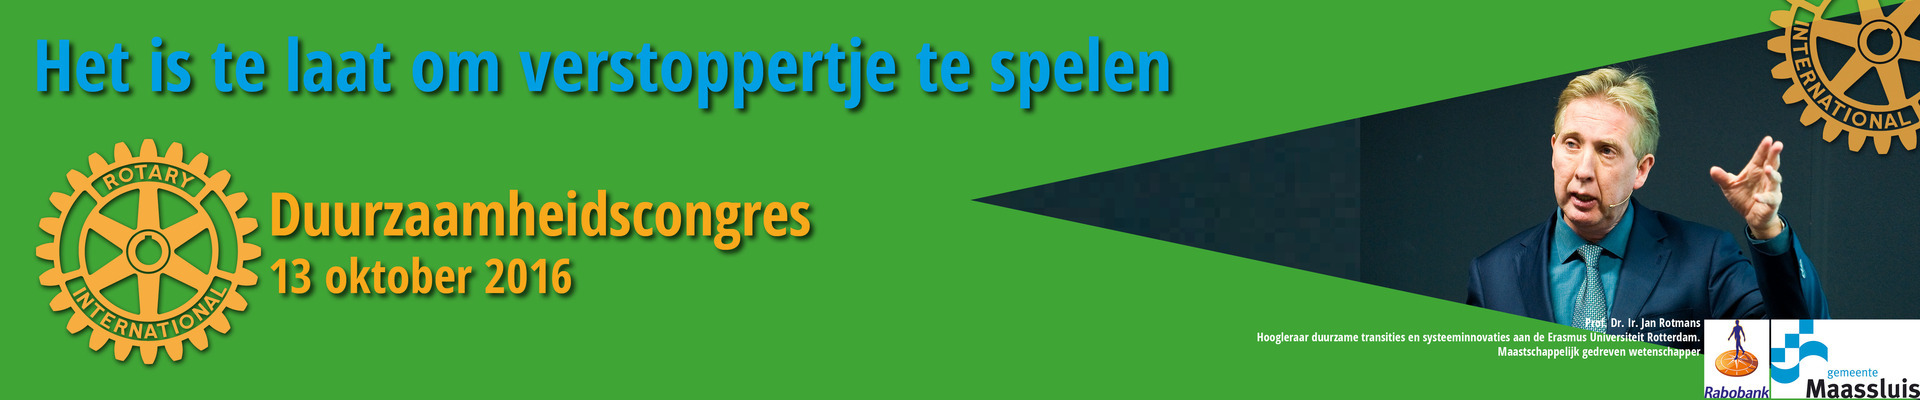 Rotary Duurzaamheidscongres 2016